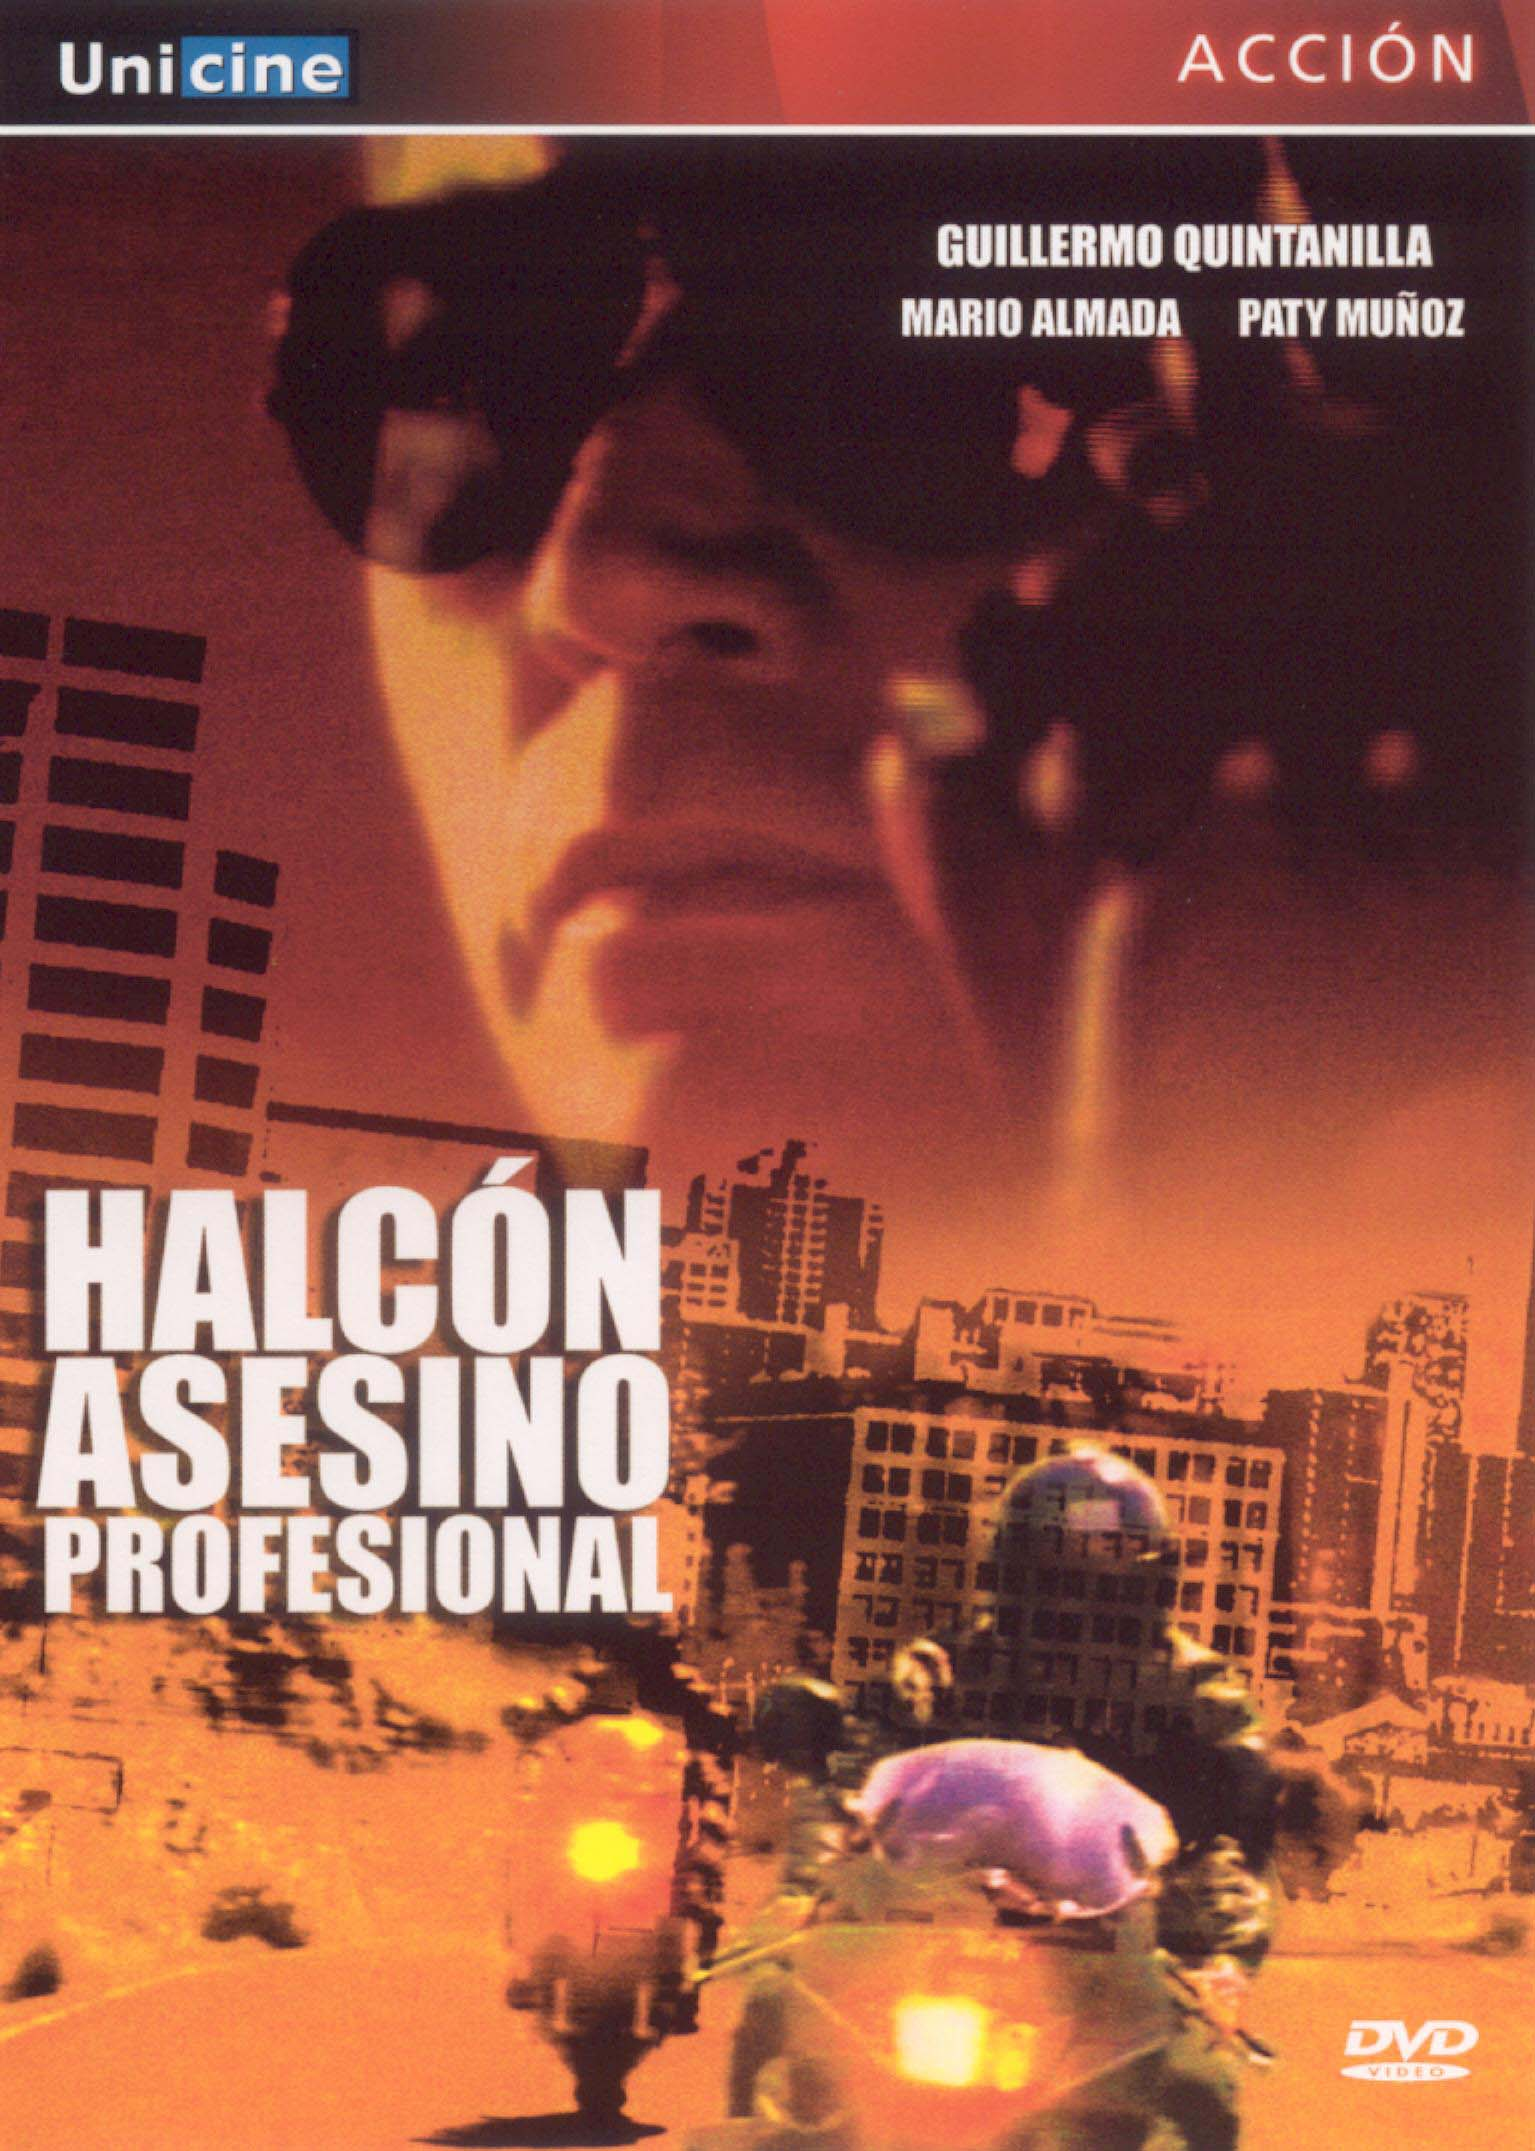 Halcon, Asesino Professional